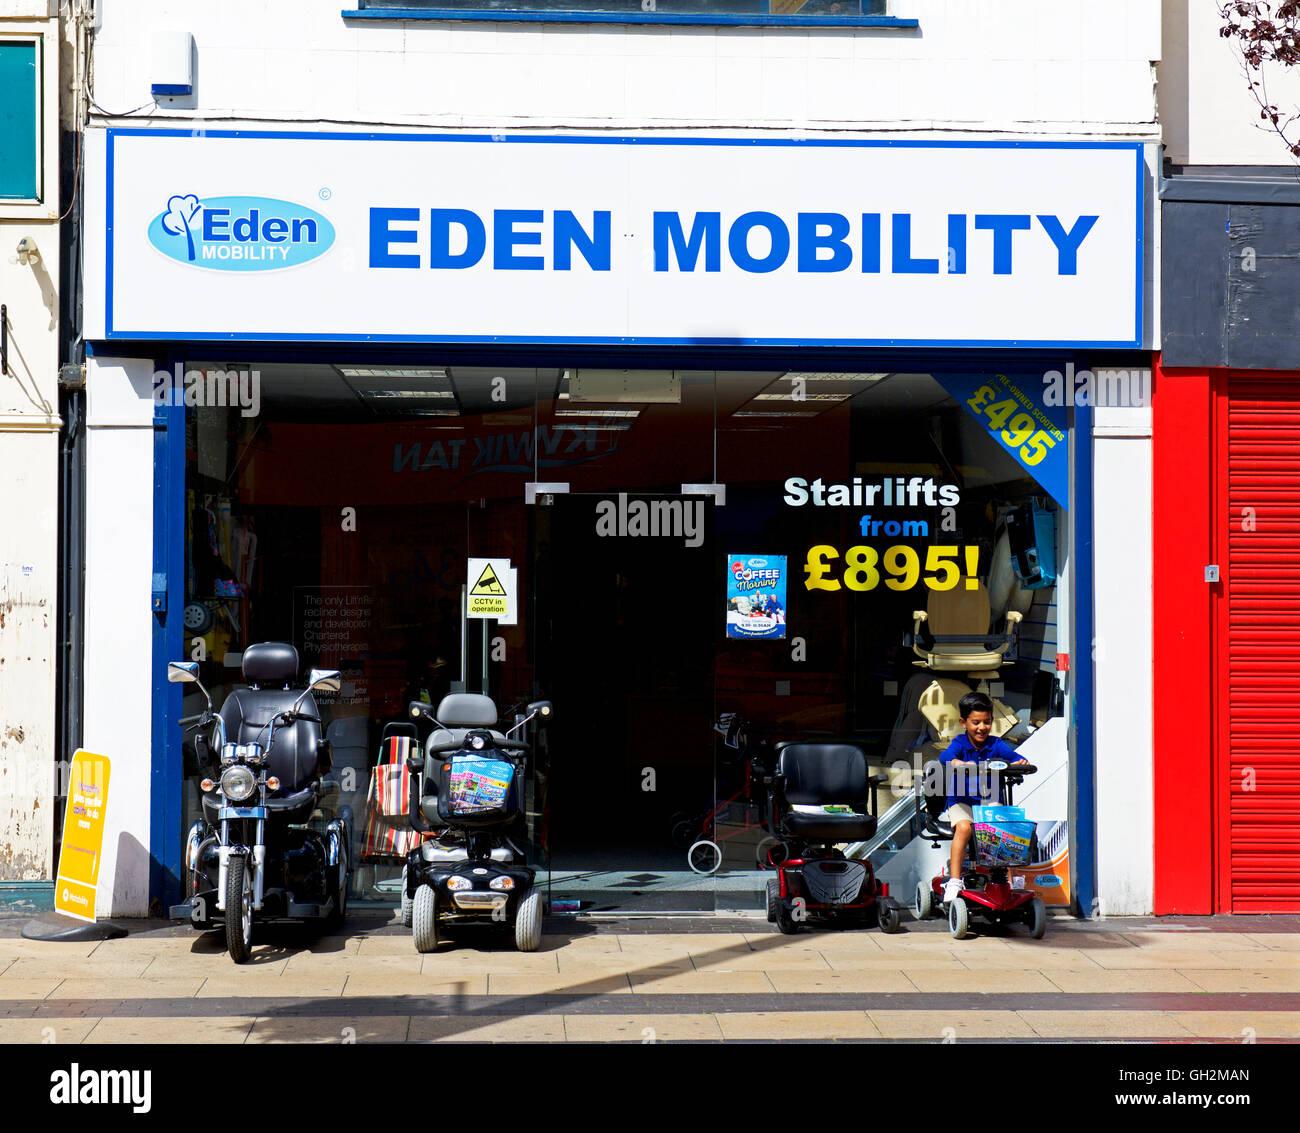 Shop - Eden - Verkauf Mobilität Scooter, England UK Stockbild